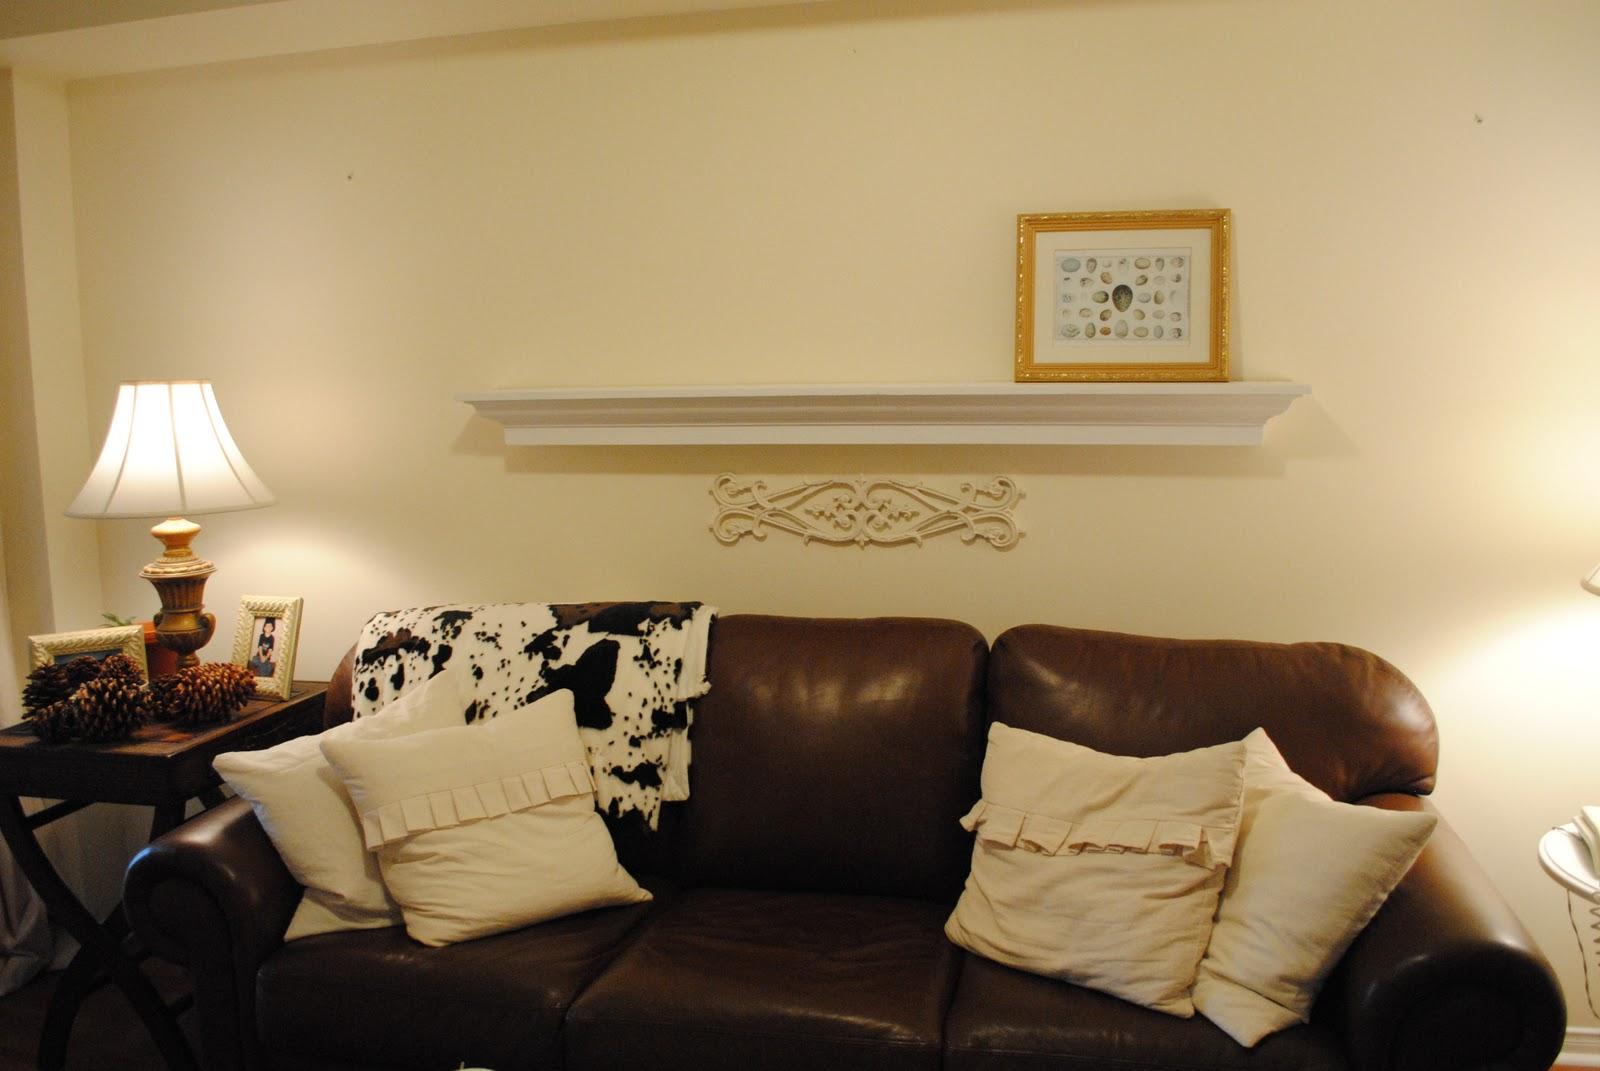 Rustic Maple: Living Room design ideas needed!